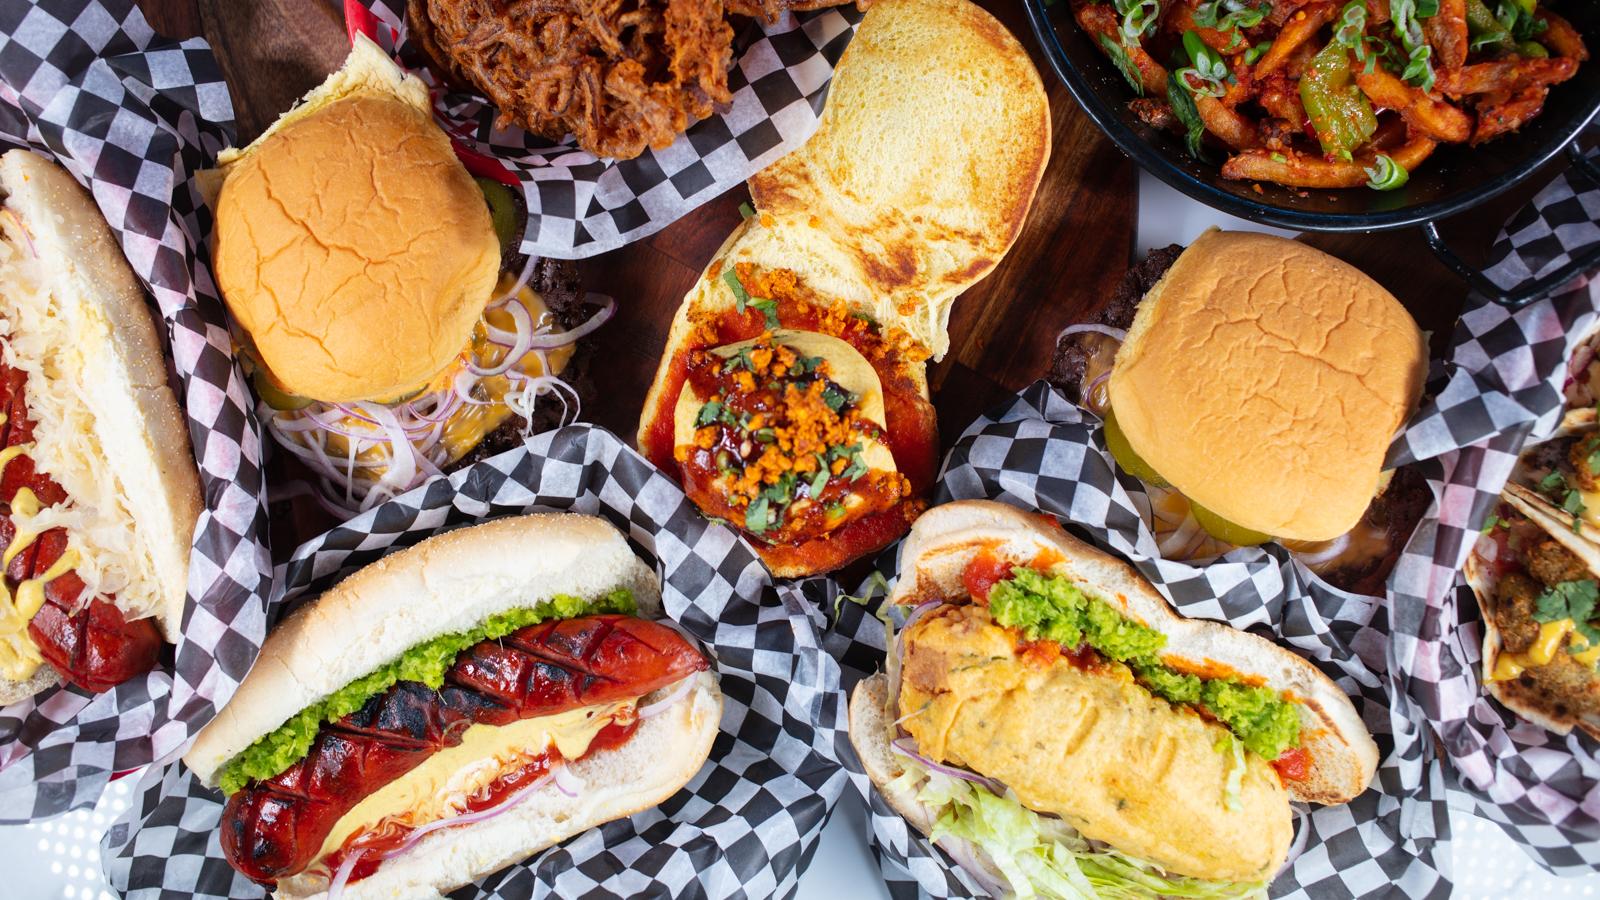 The Dirty Burger Company 211 Hunter St W, Peterborough